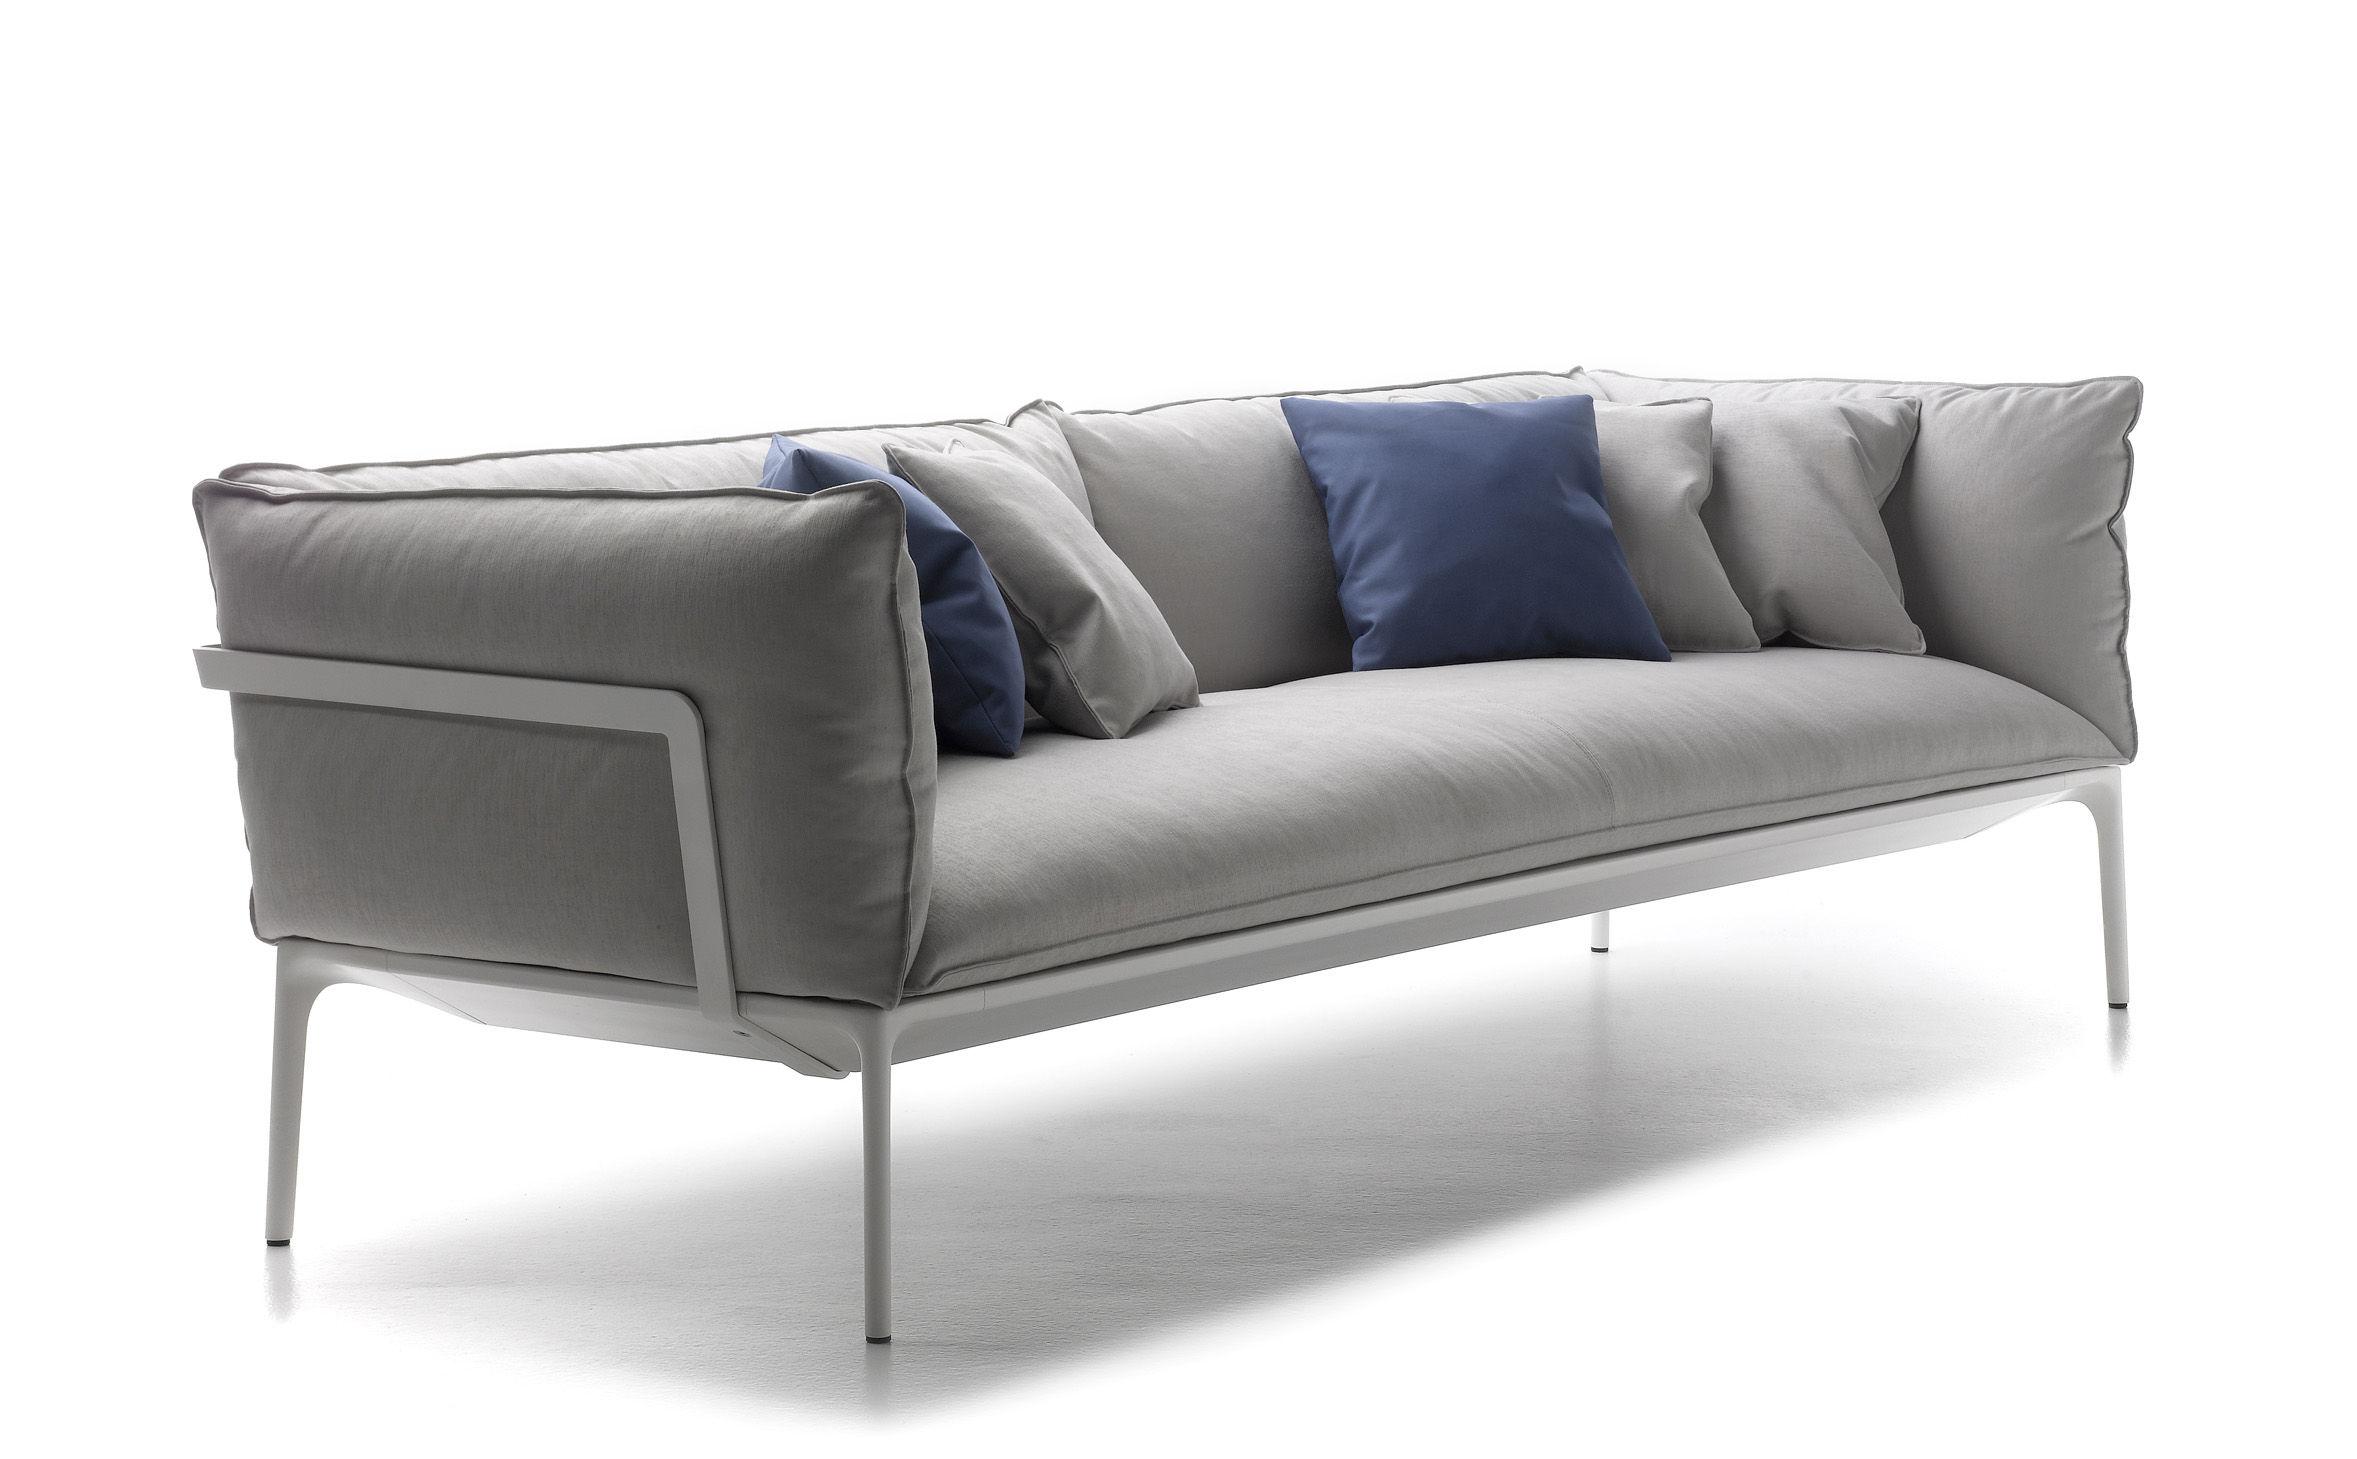 yale 2 sitzer l 160 cm mdf italia sofa. Black Bedroom Furniture Sets. Home Design Ideas